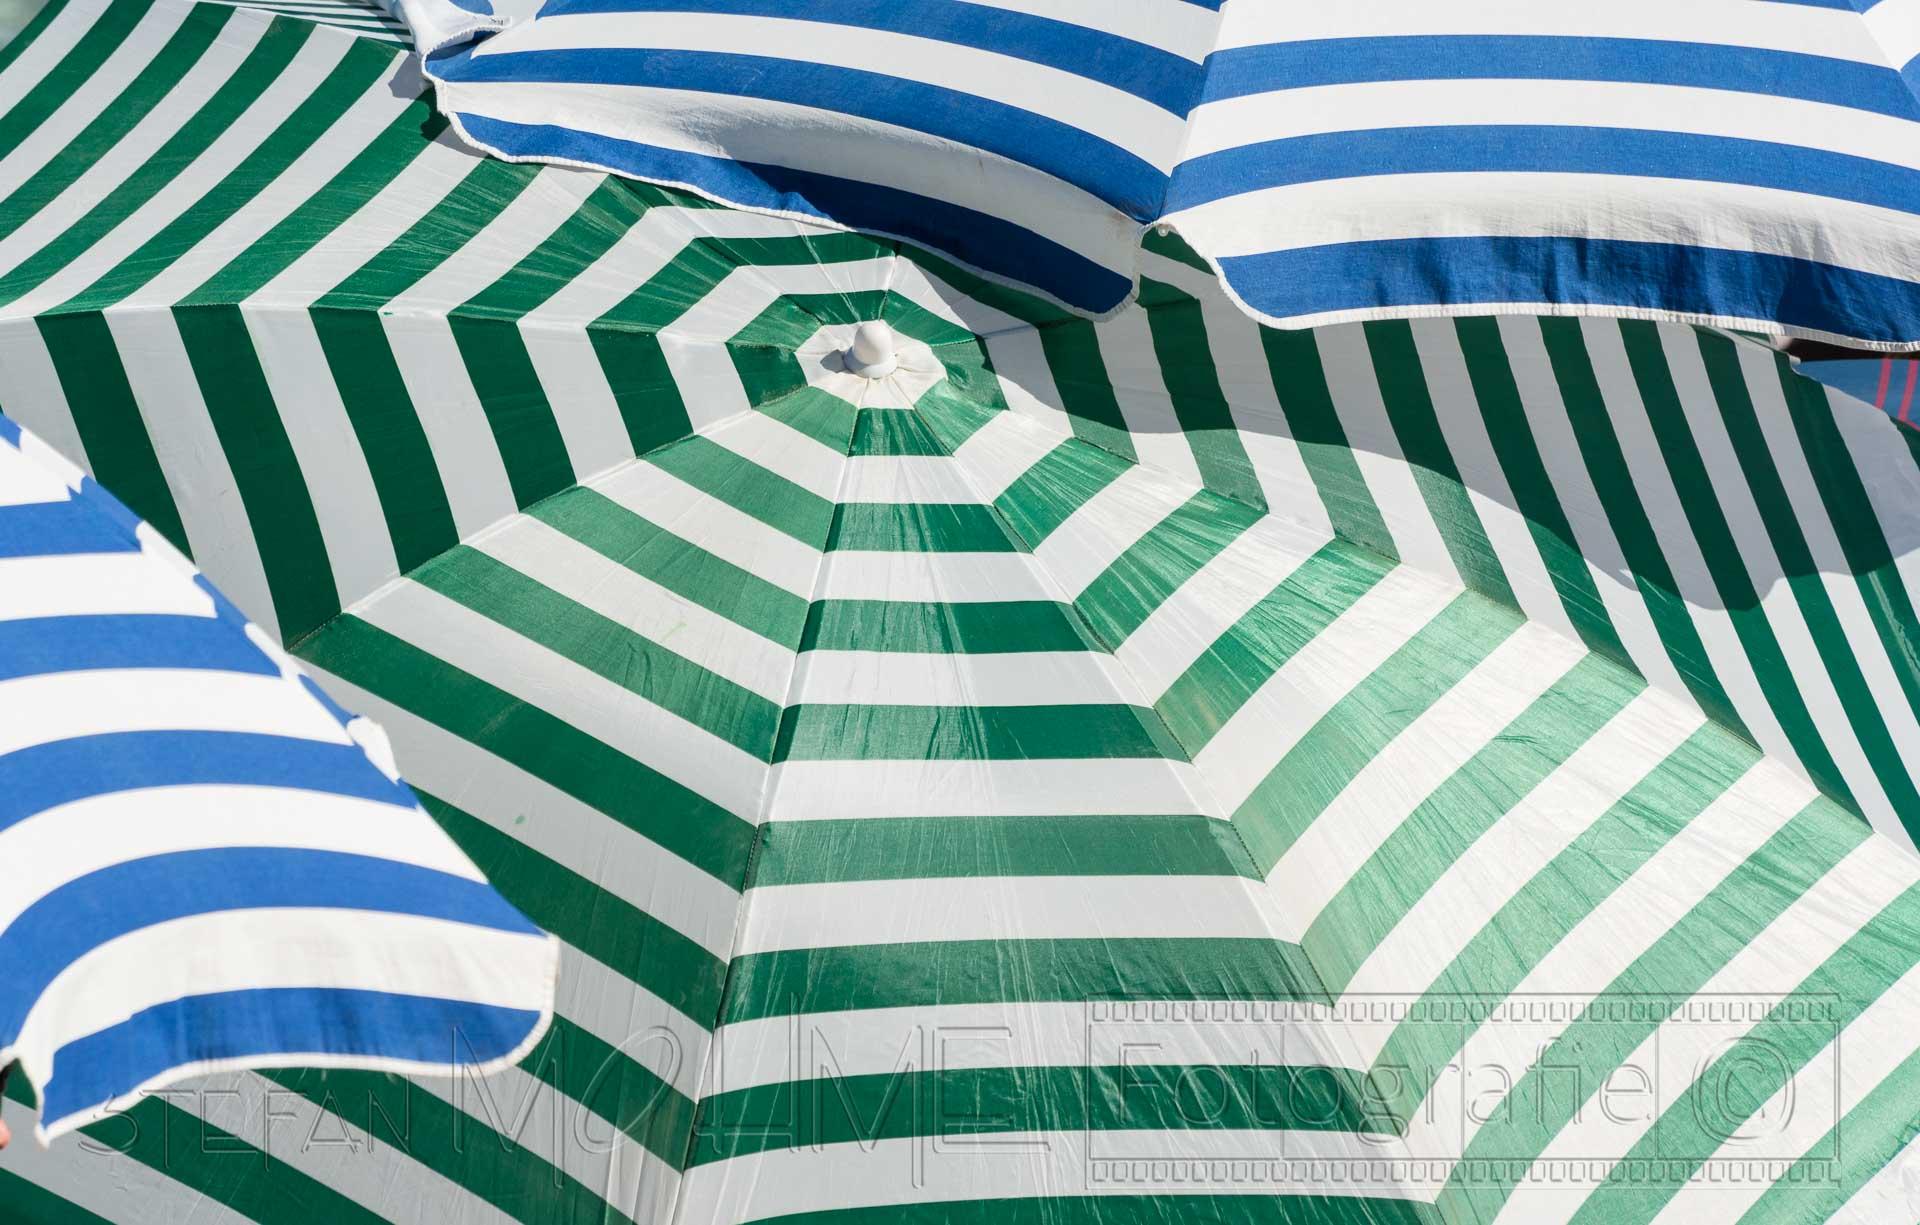 Sonnenschirm,detail,farbig,gruen